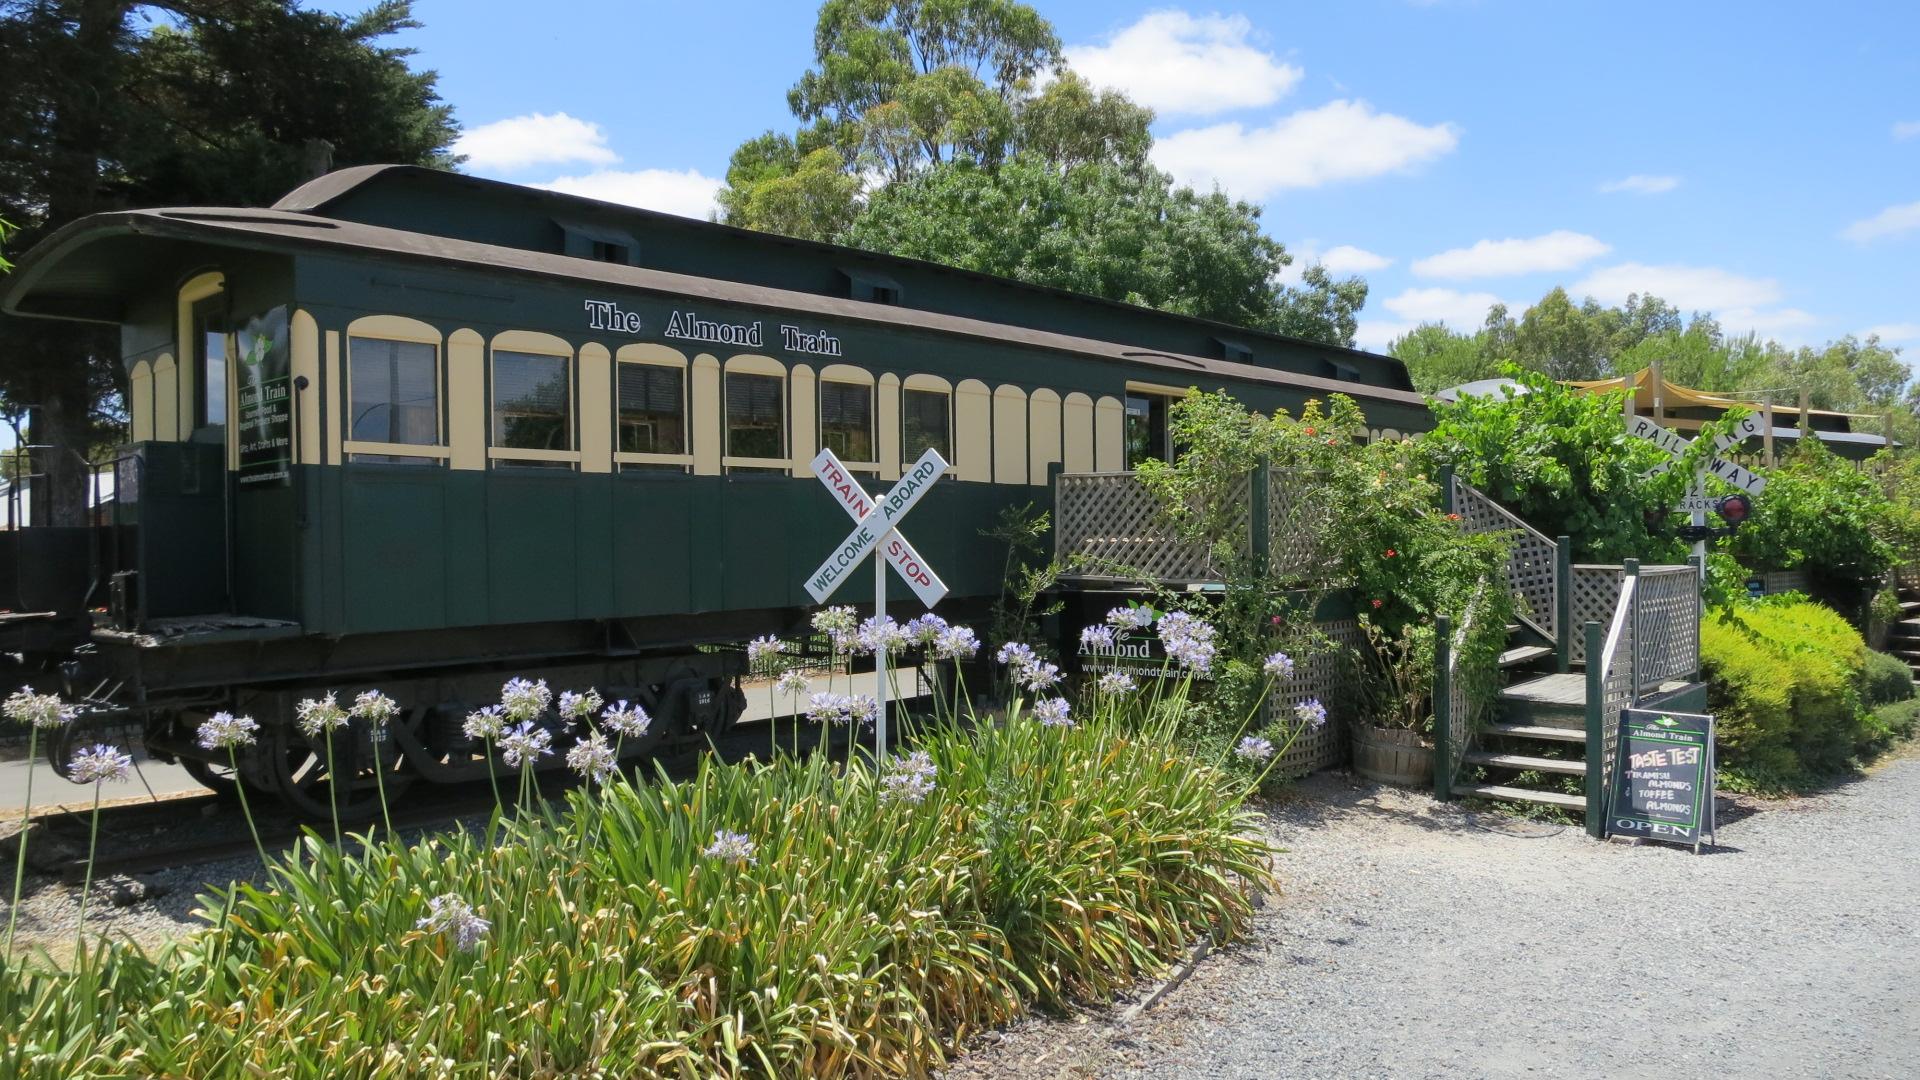 Almond Train - McLaren Vale